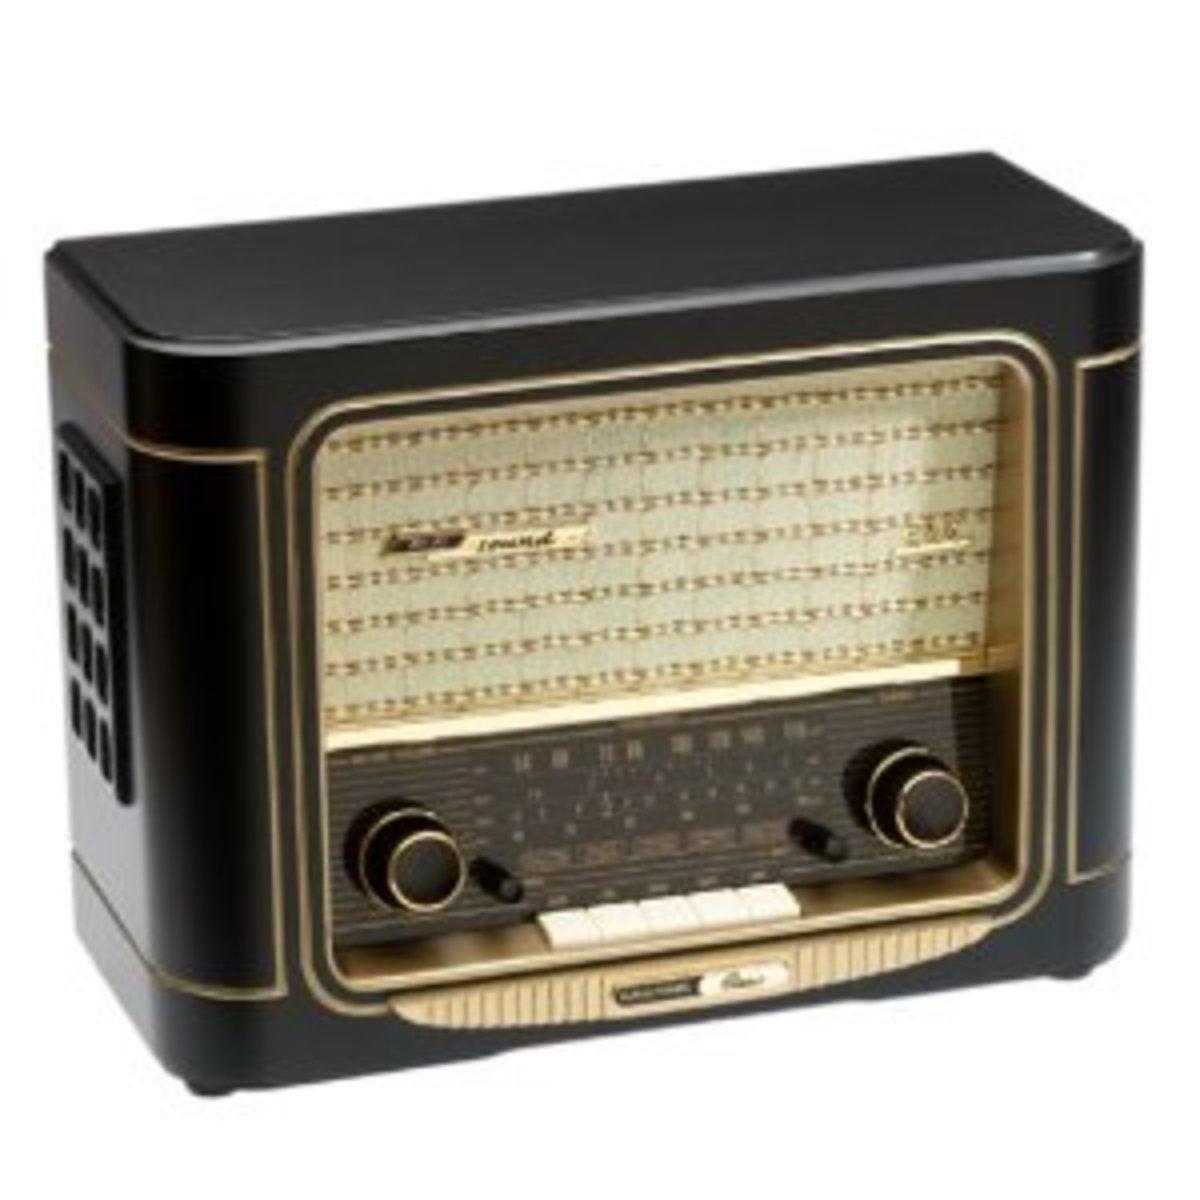 Grundig 960 Classic AM/FM Shortwave Radio